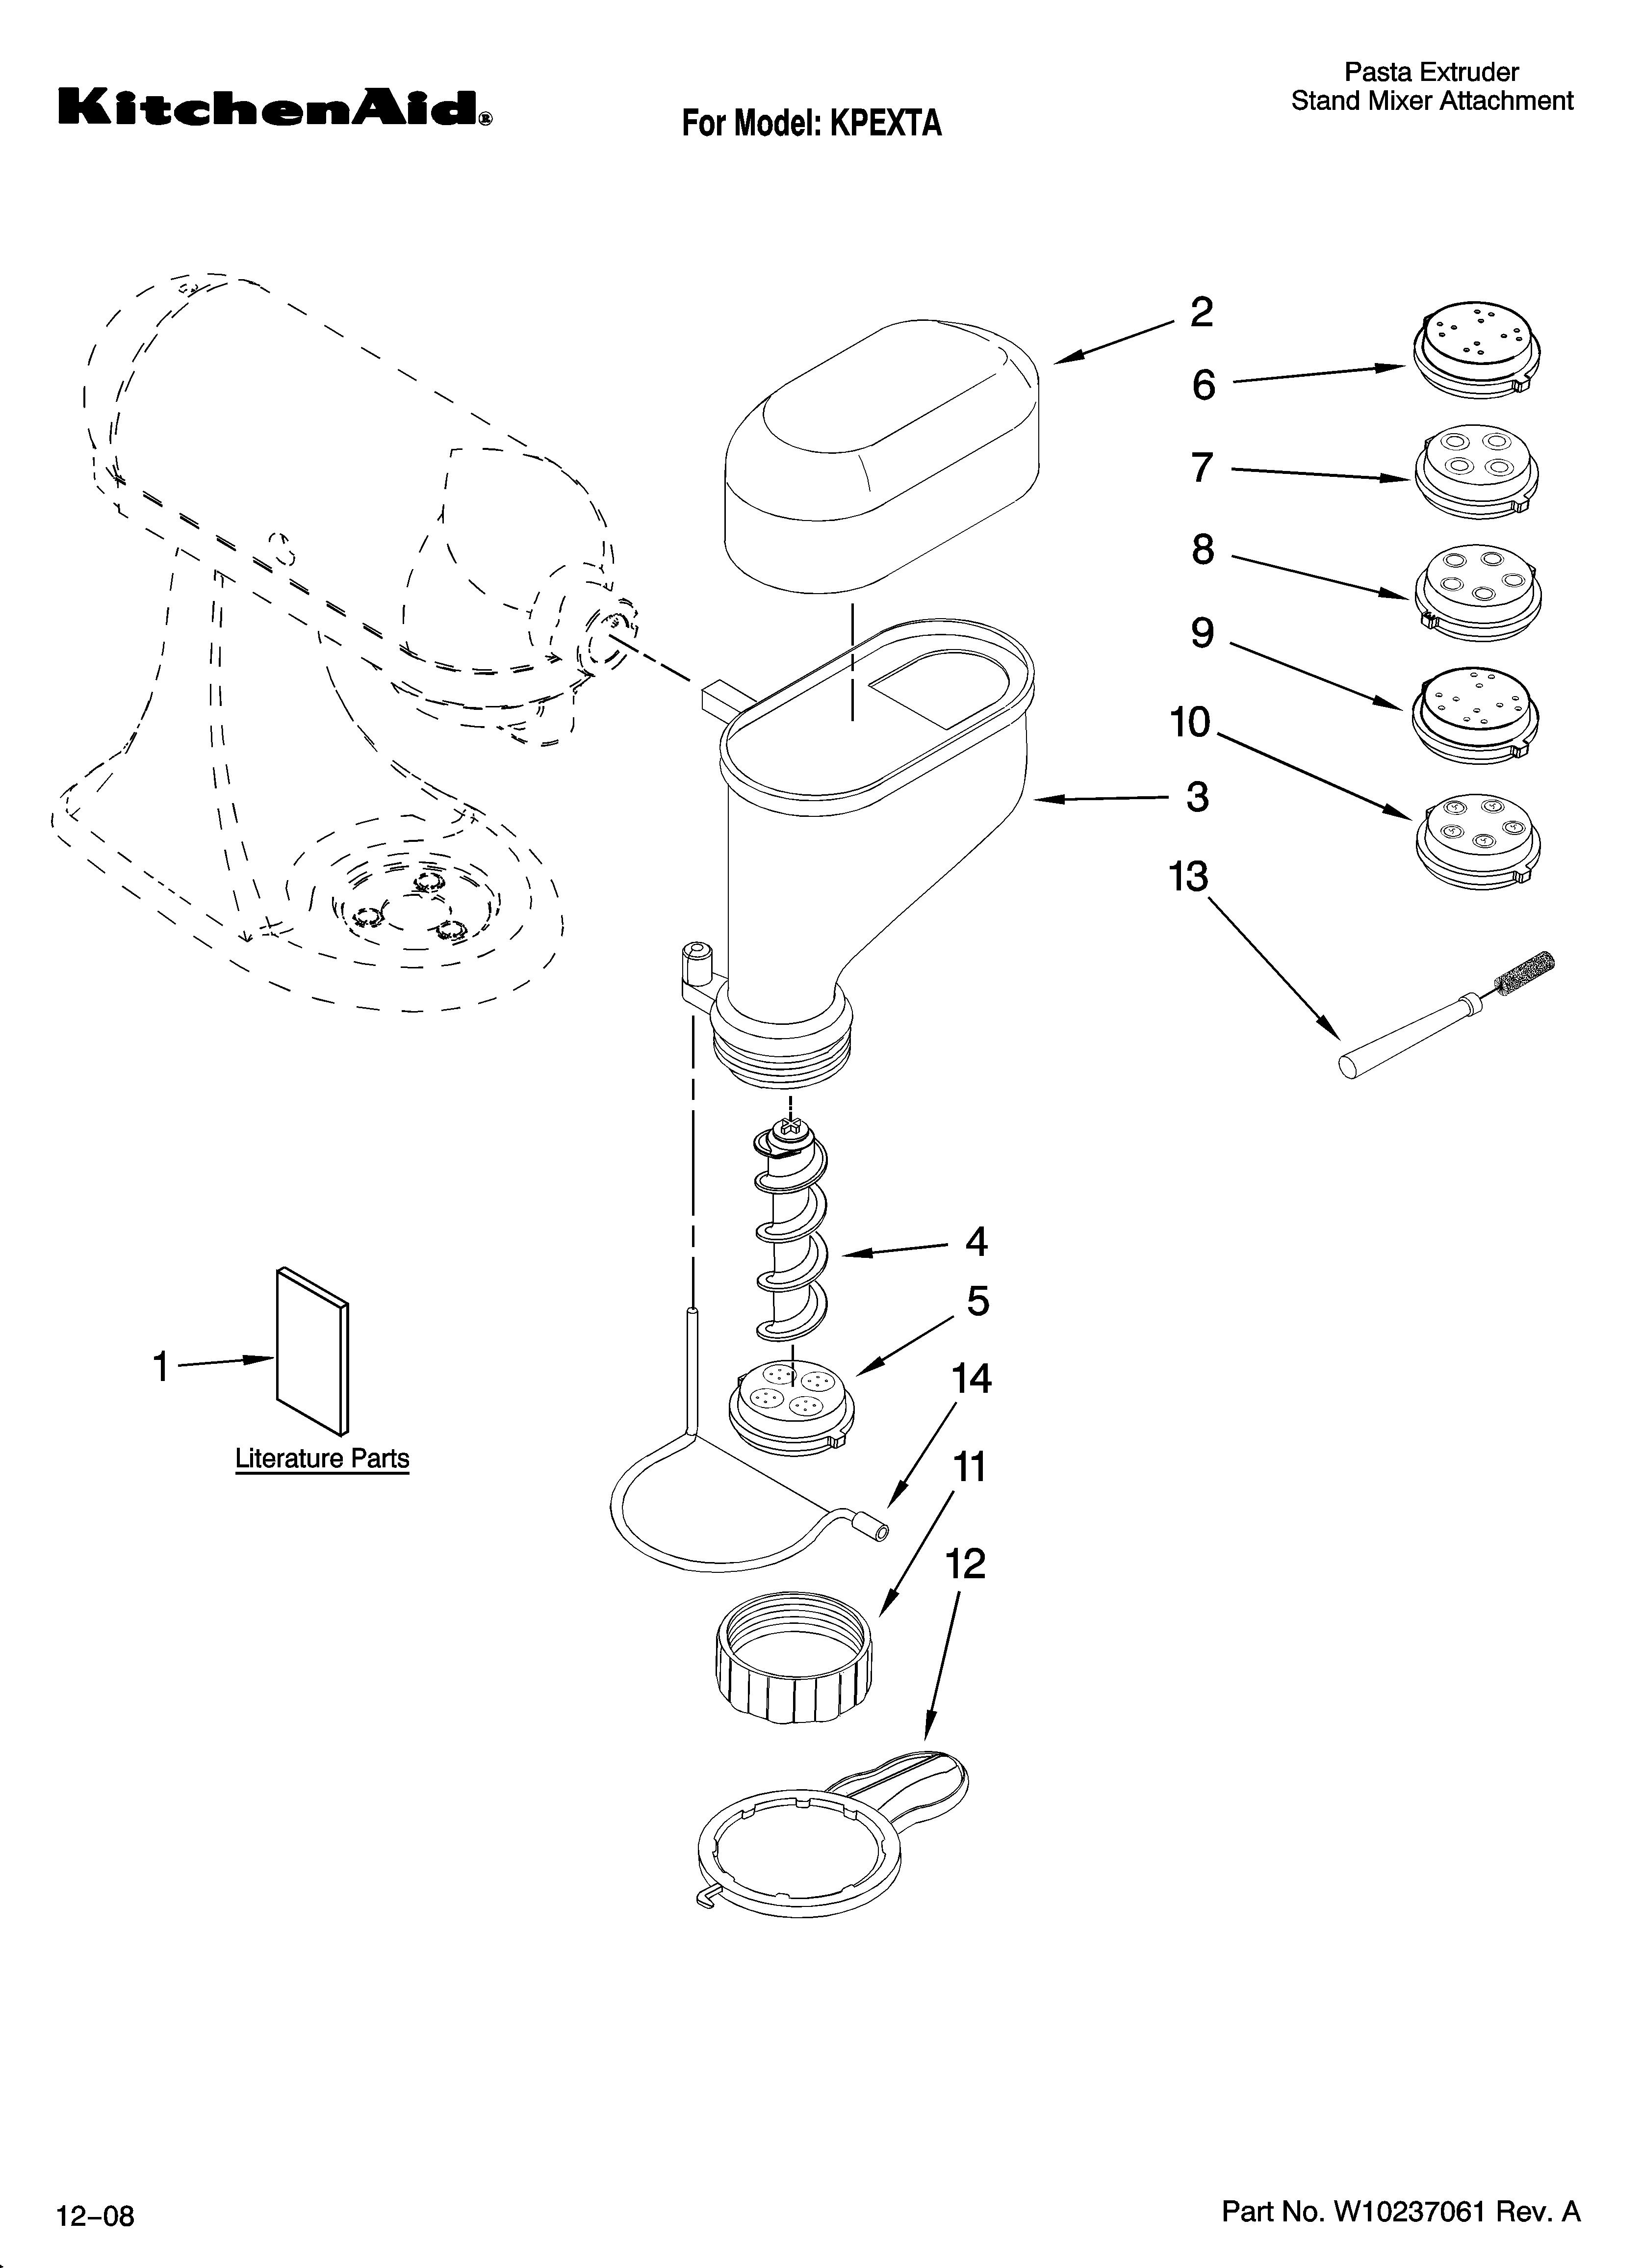 Kitchenaid Attachment Pasta Kitchen Ideas Mixer Parts Diagram Furthermore